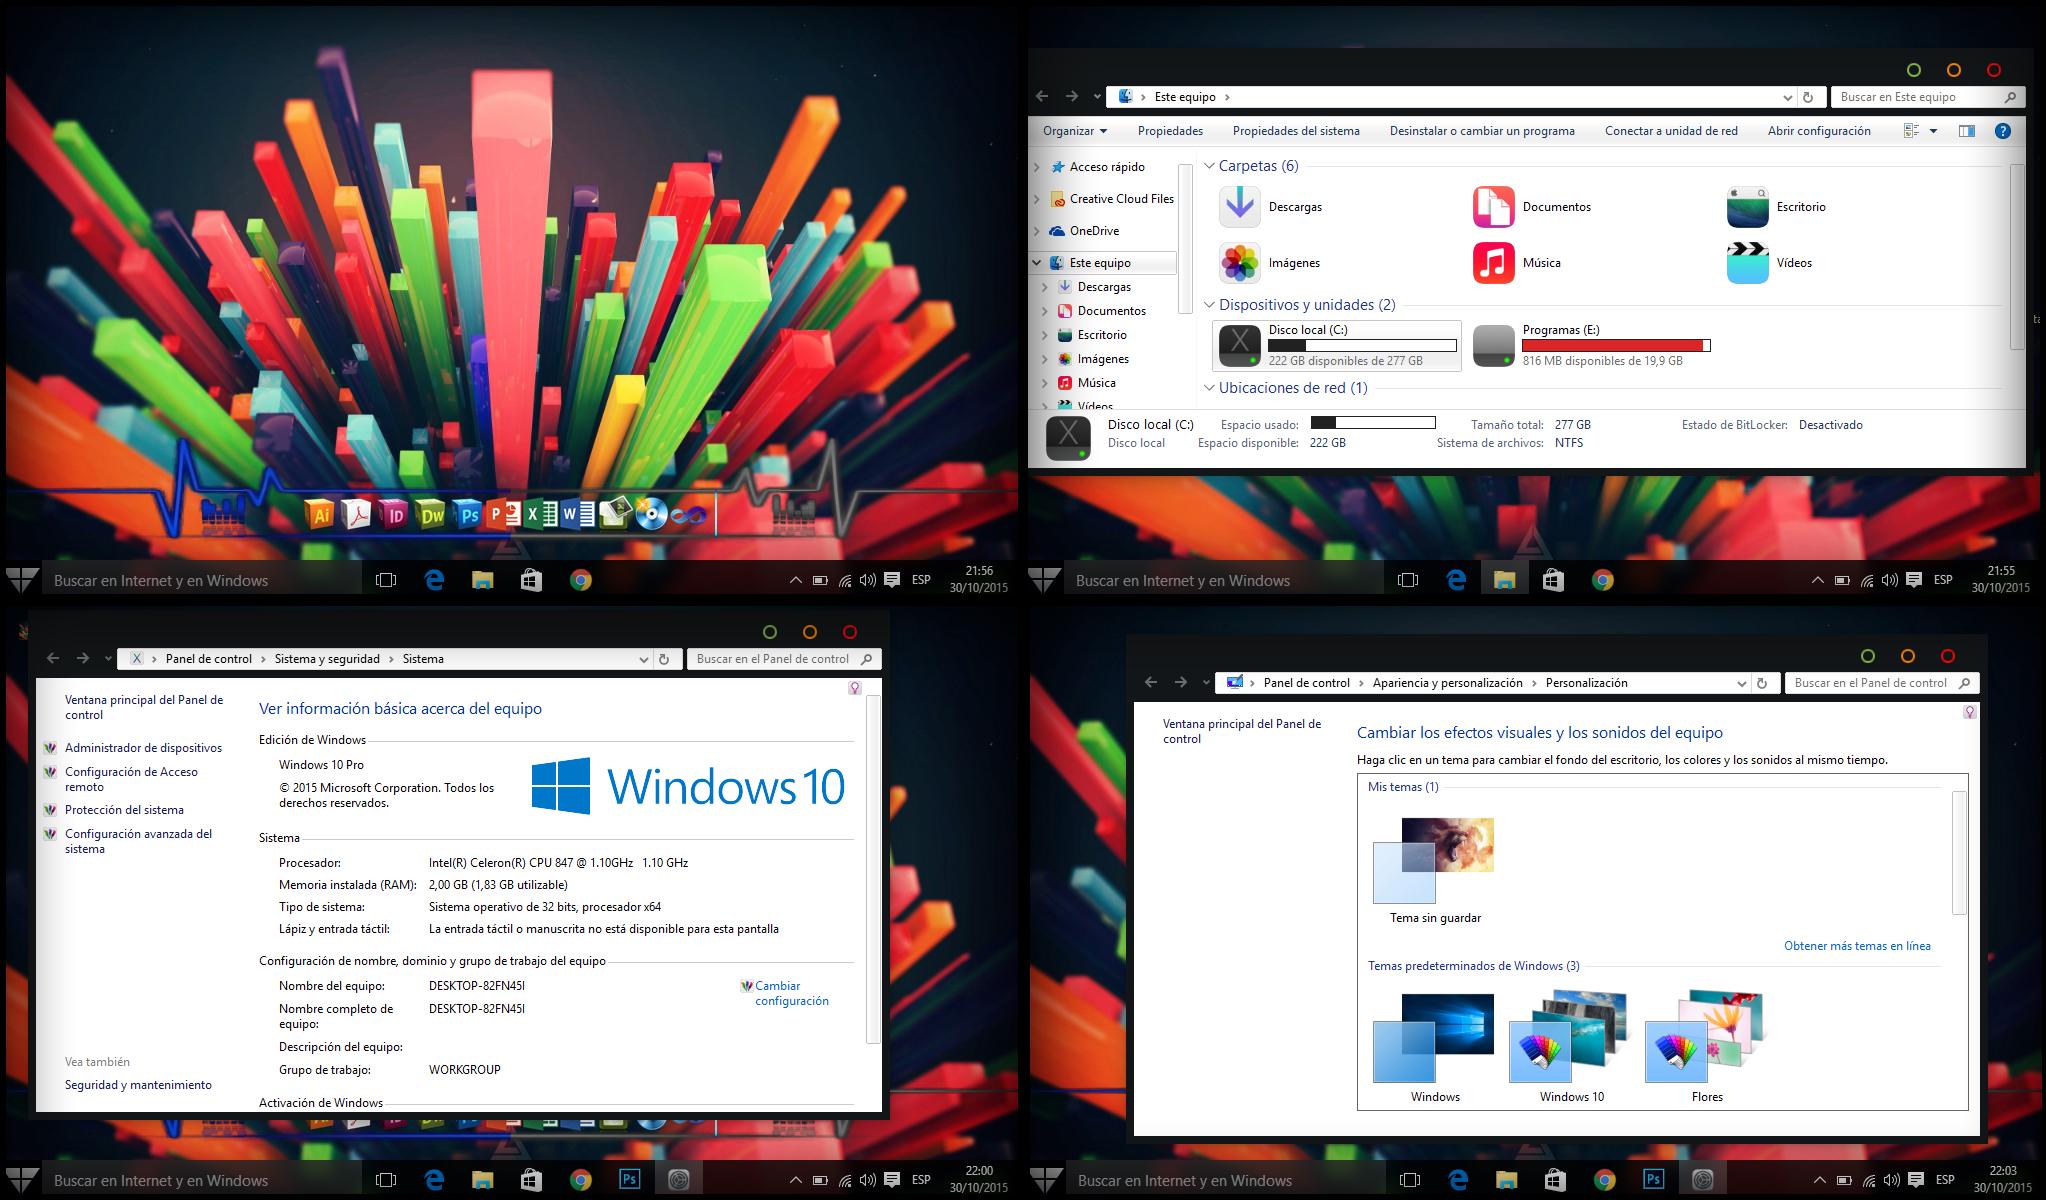 Tema Minimalista Windows 10 by Pcnafer